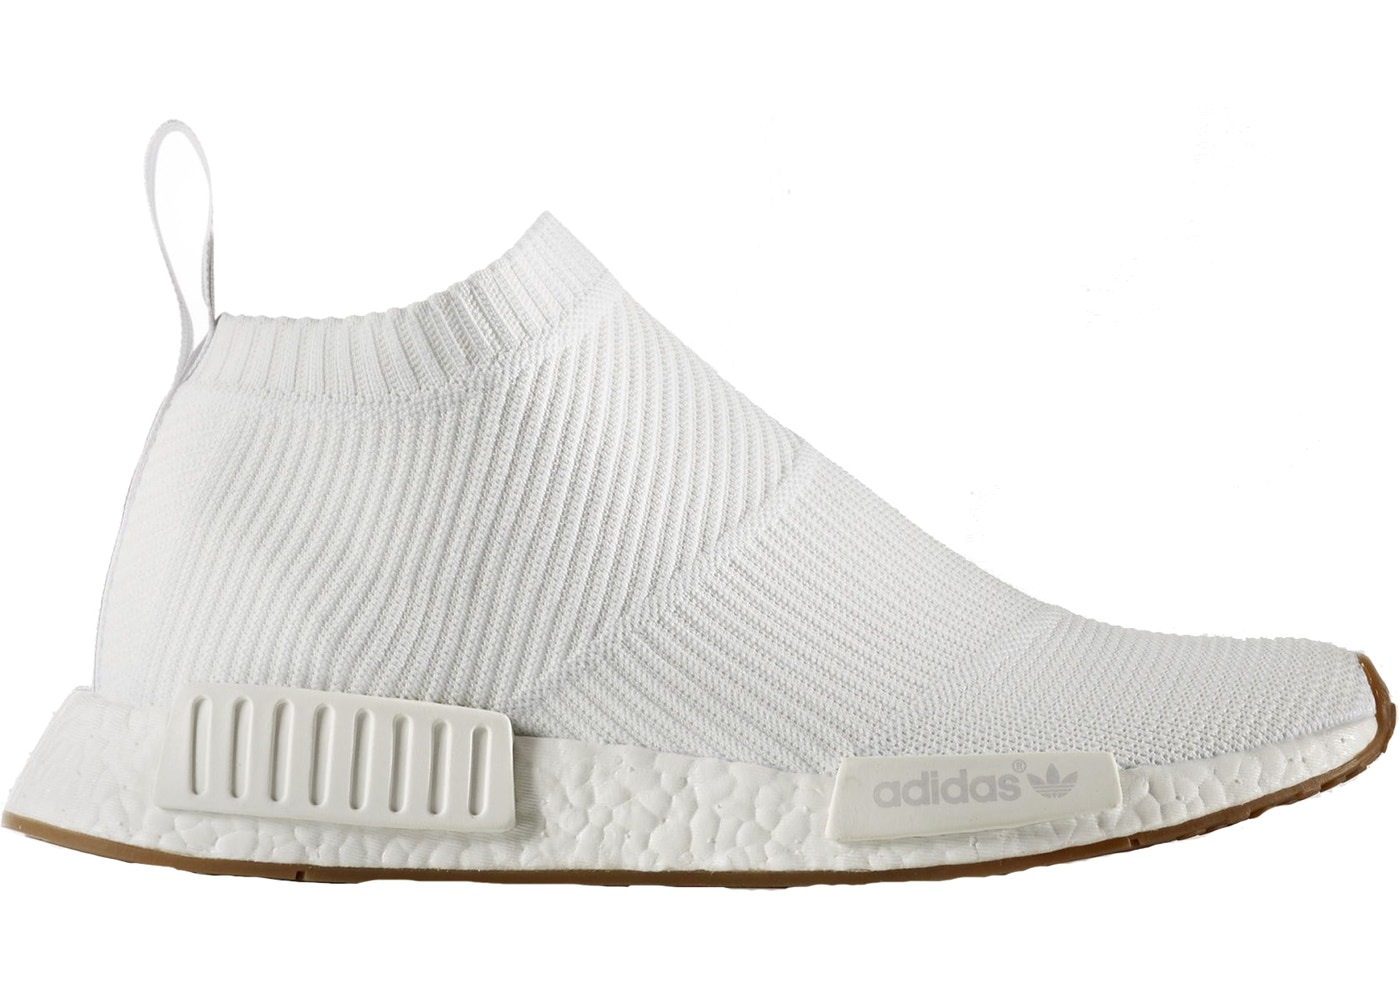 Lo anterior resistencia Salida  adidas NMD City Sock Gum Pack White - BA7208